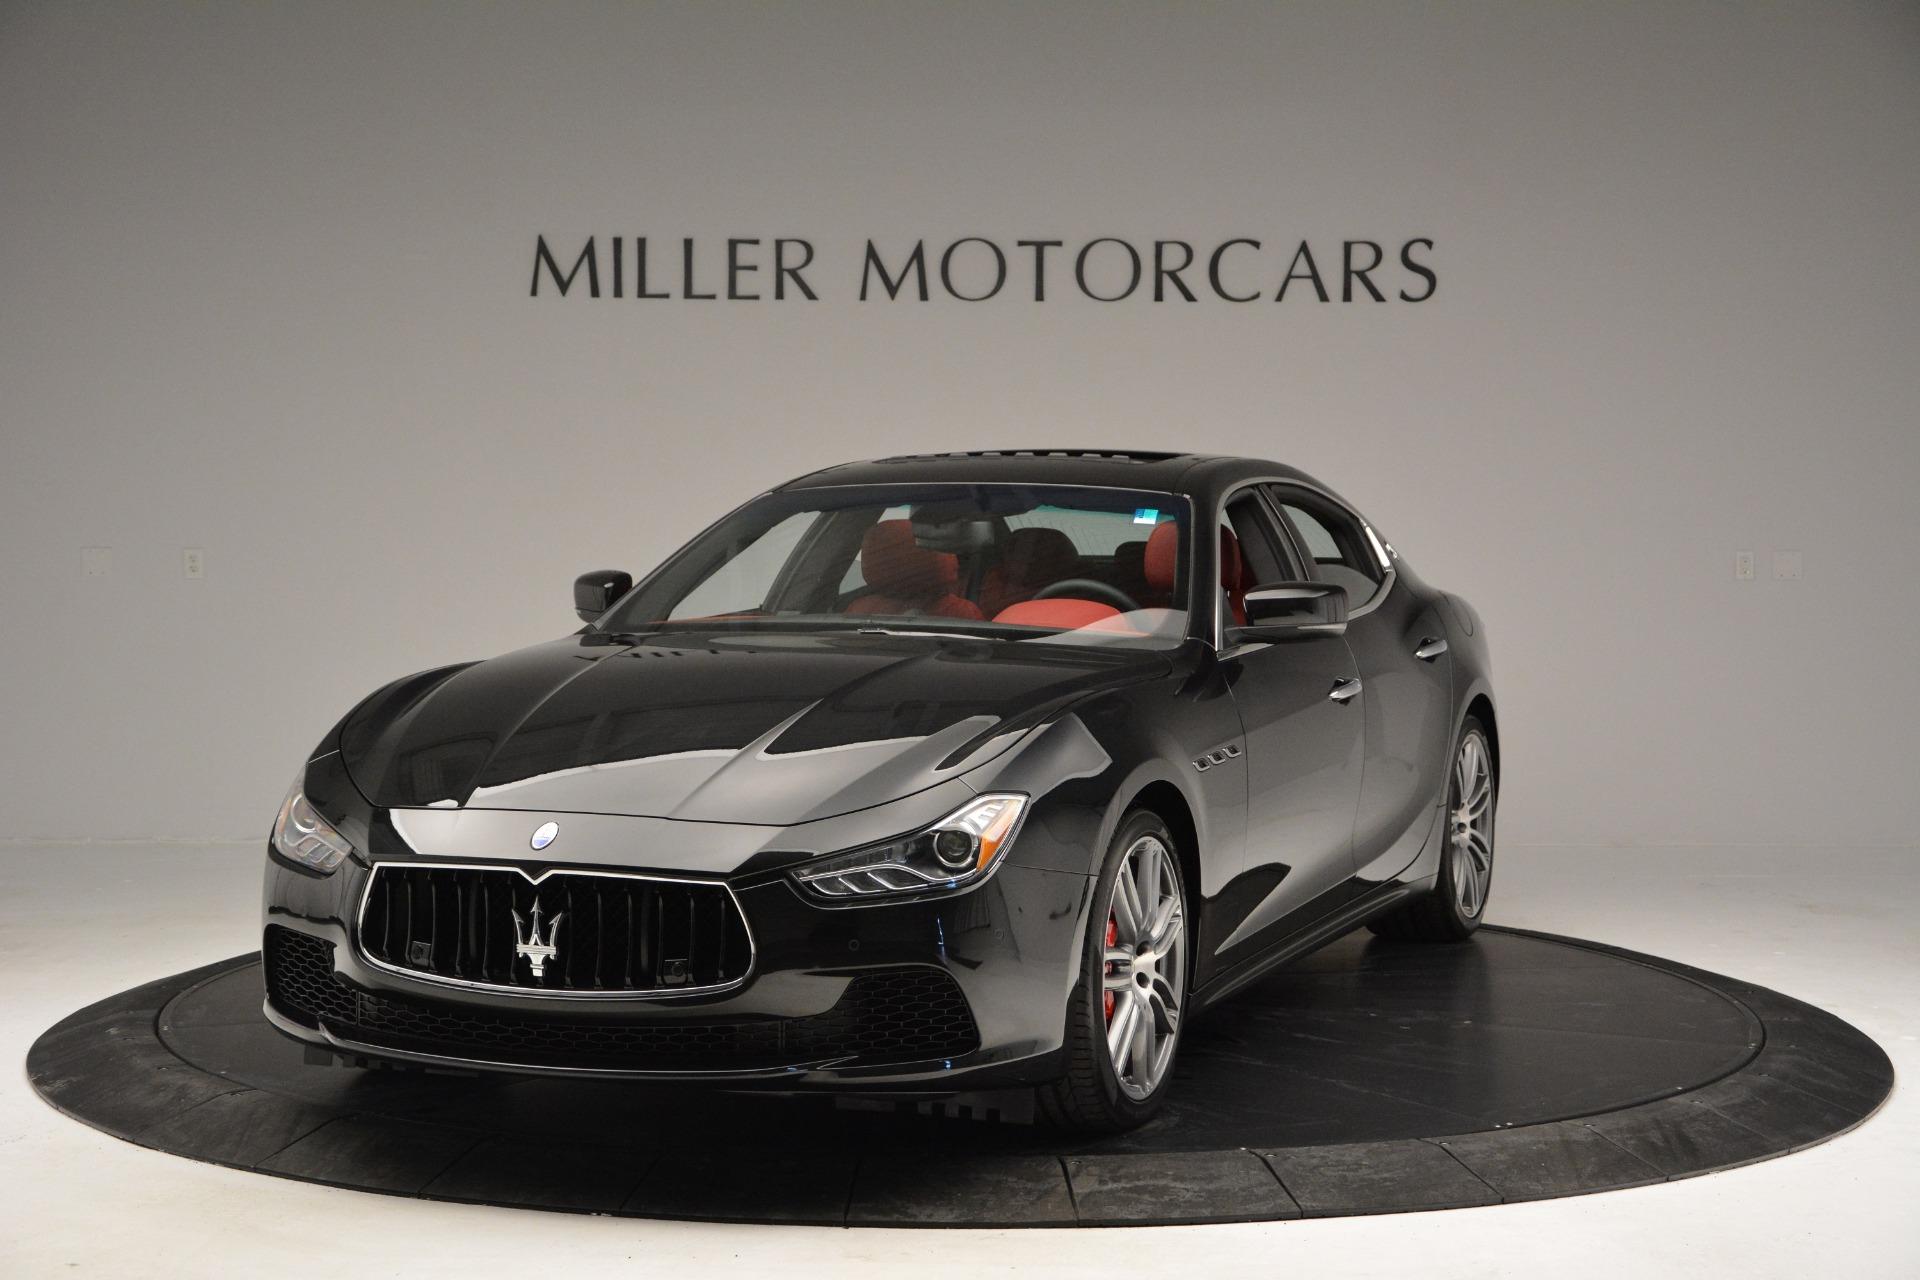 New 2017 Maserati Ghibli S Q4 For Sale In Greenwich, CT. Alfa Romeo of Greenwich, M1687 610_main